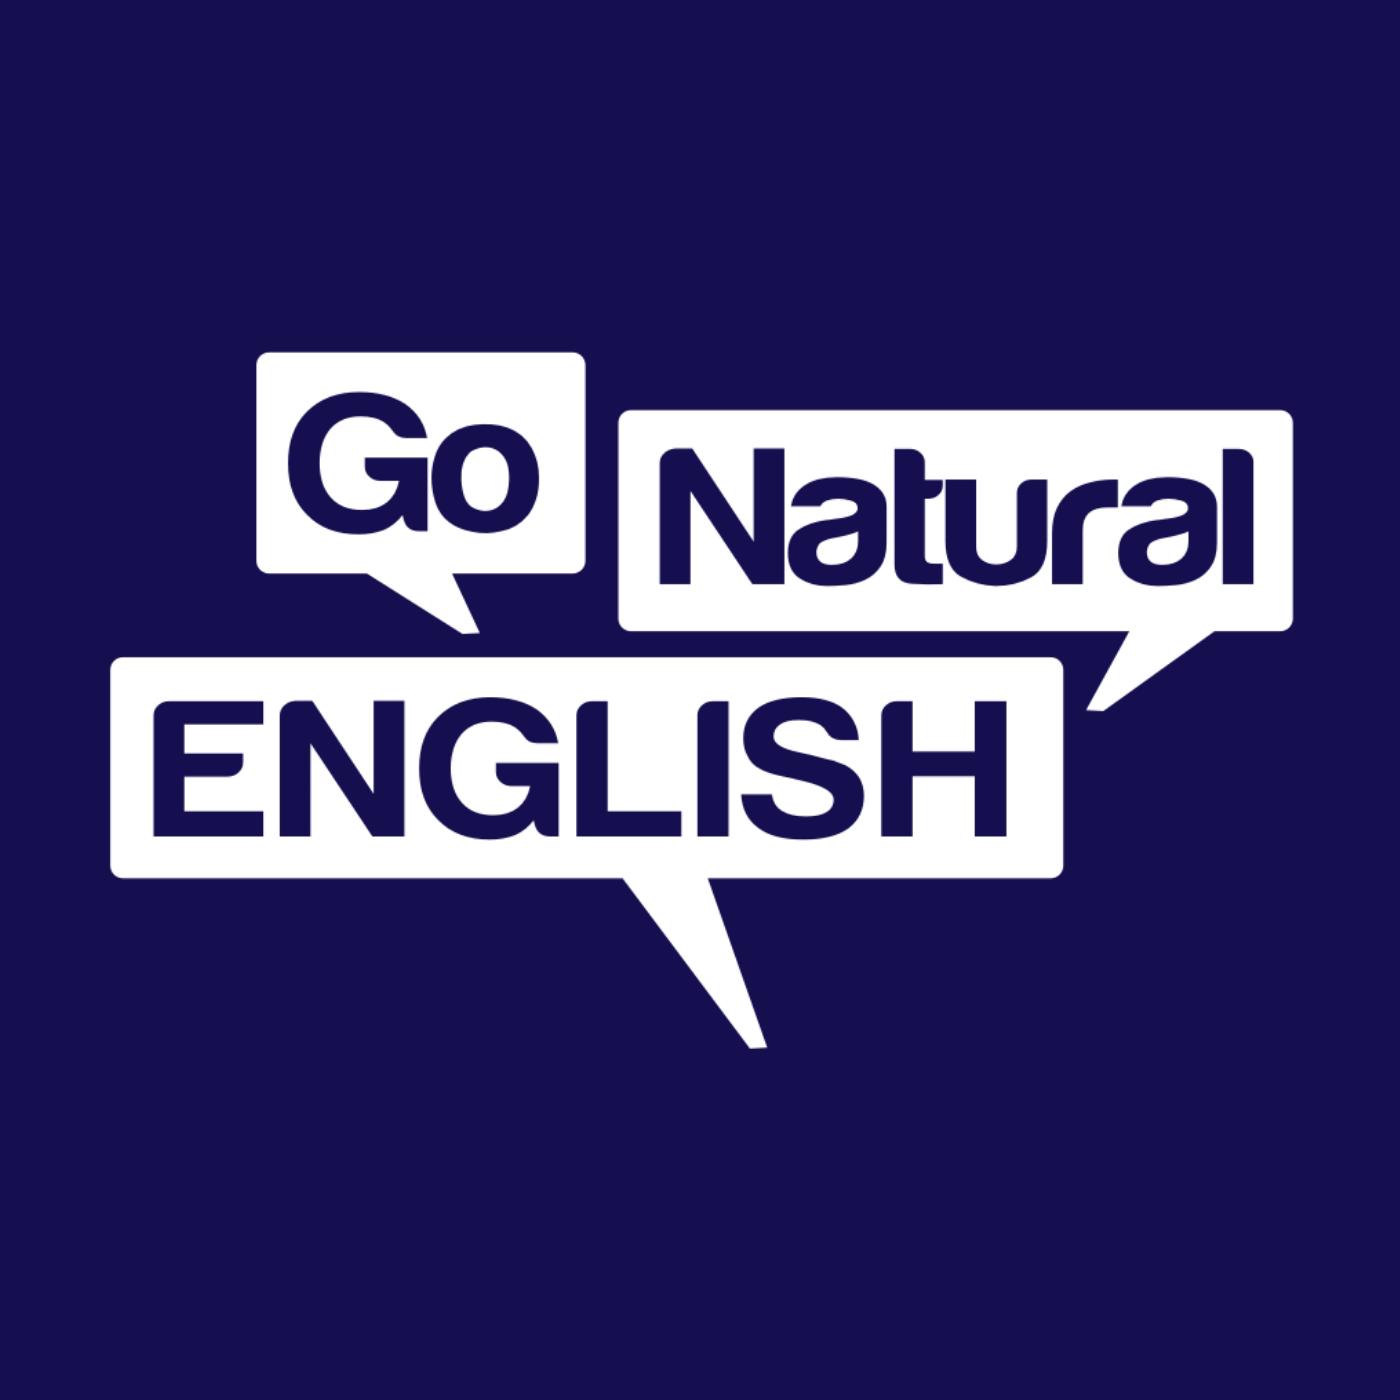 قناة Go natural English